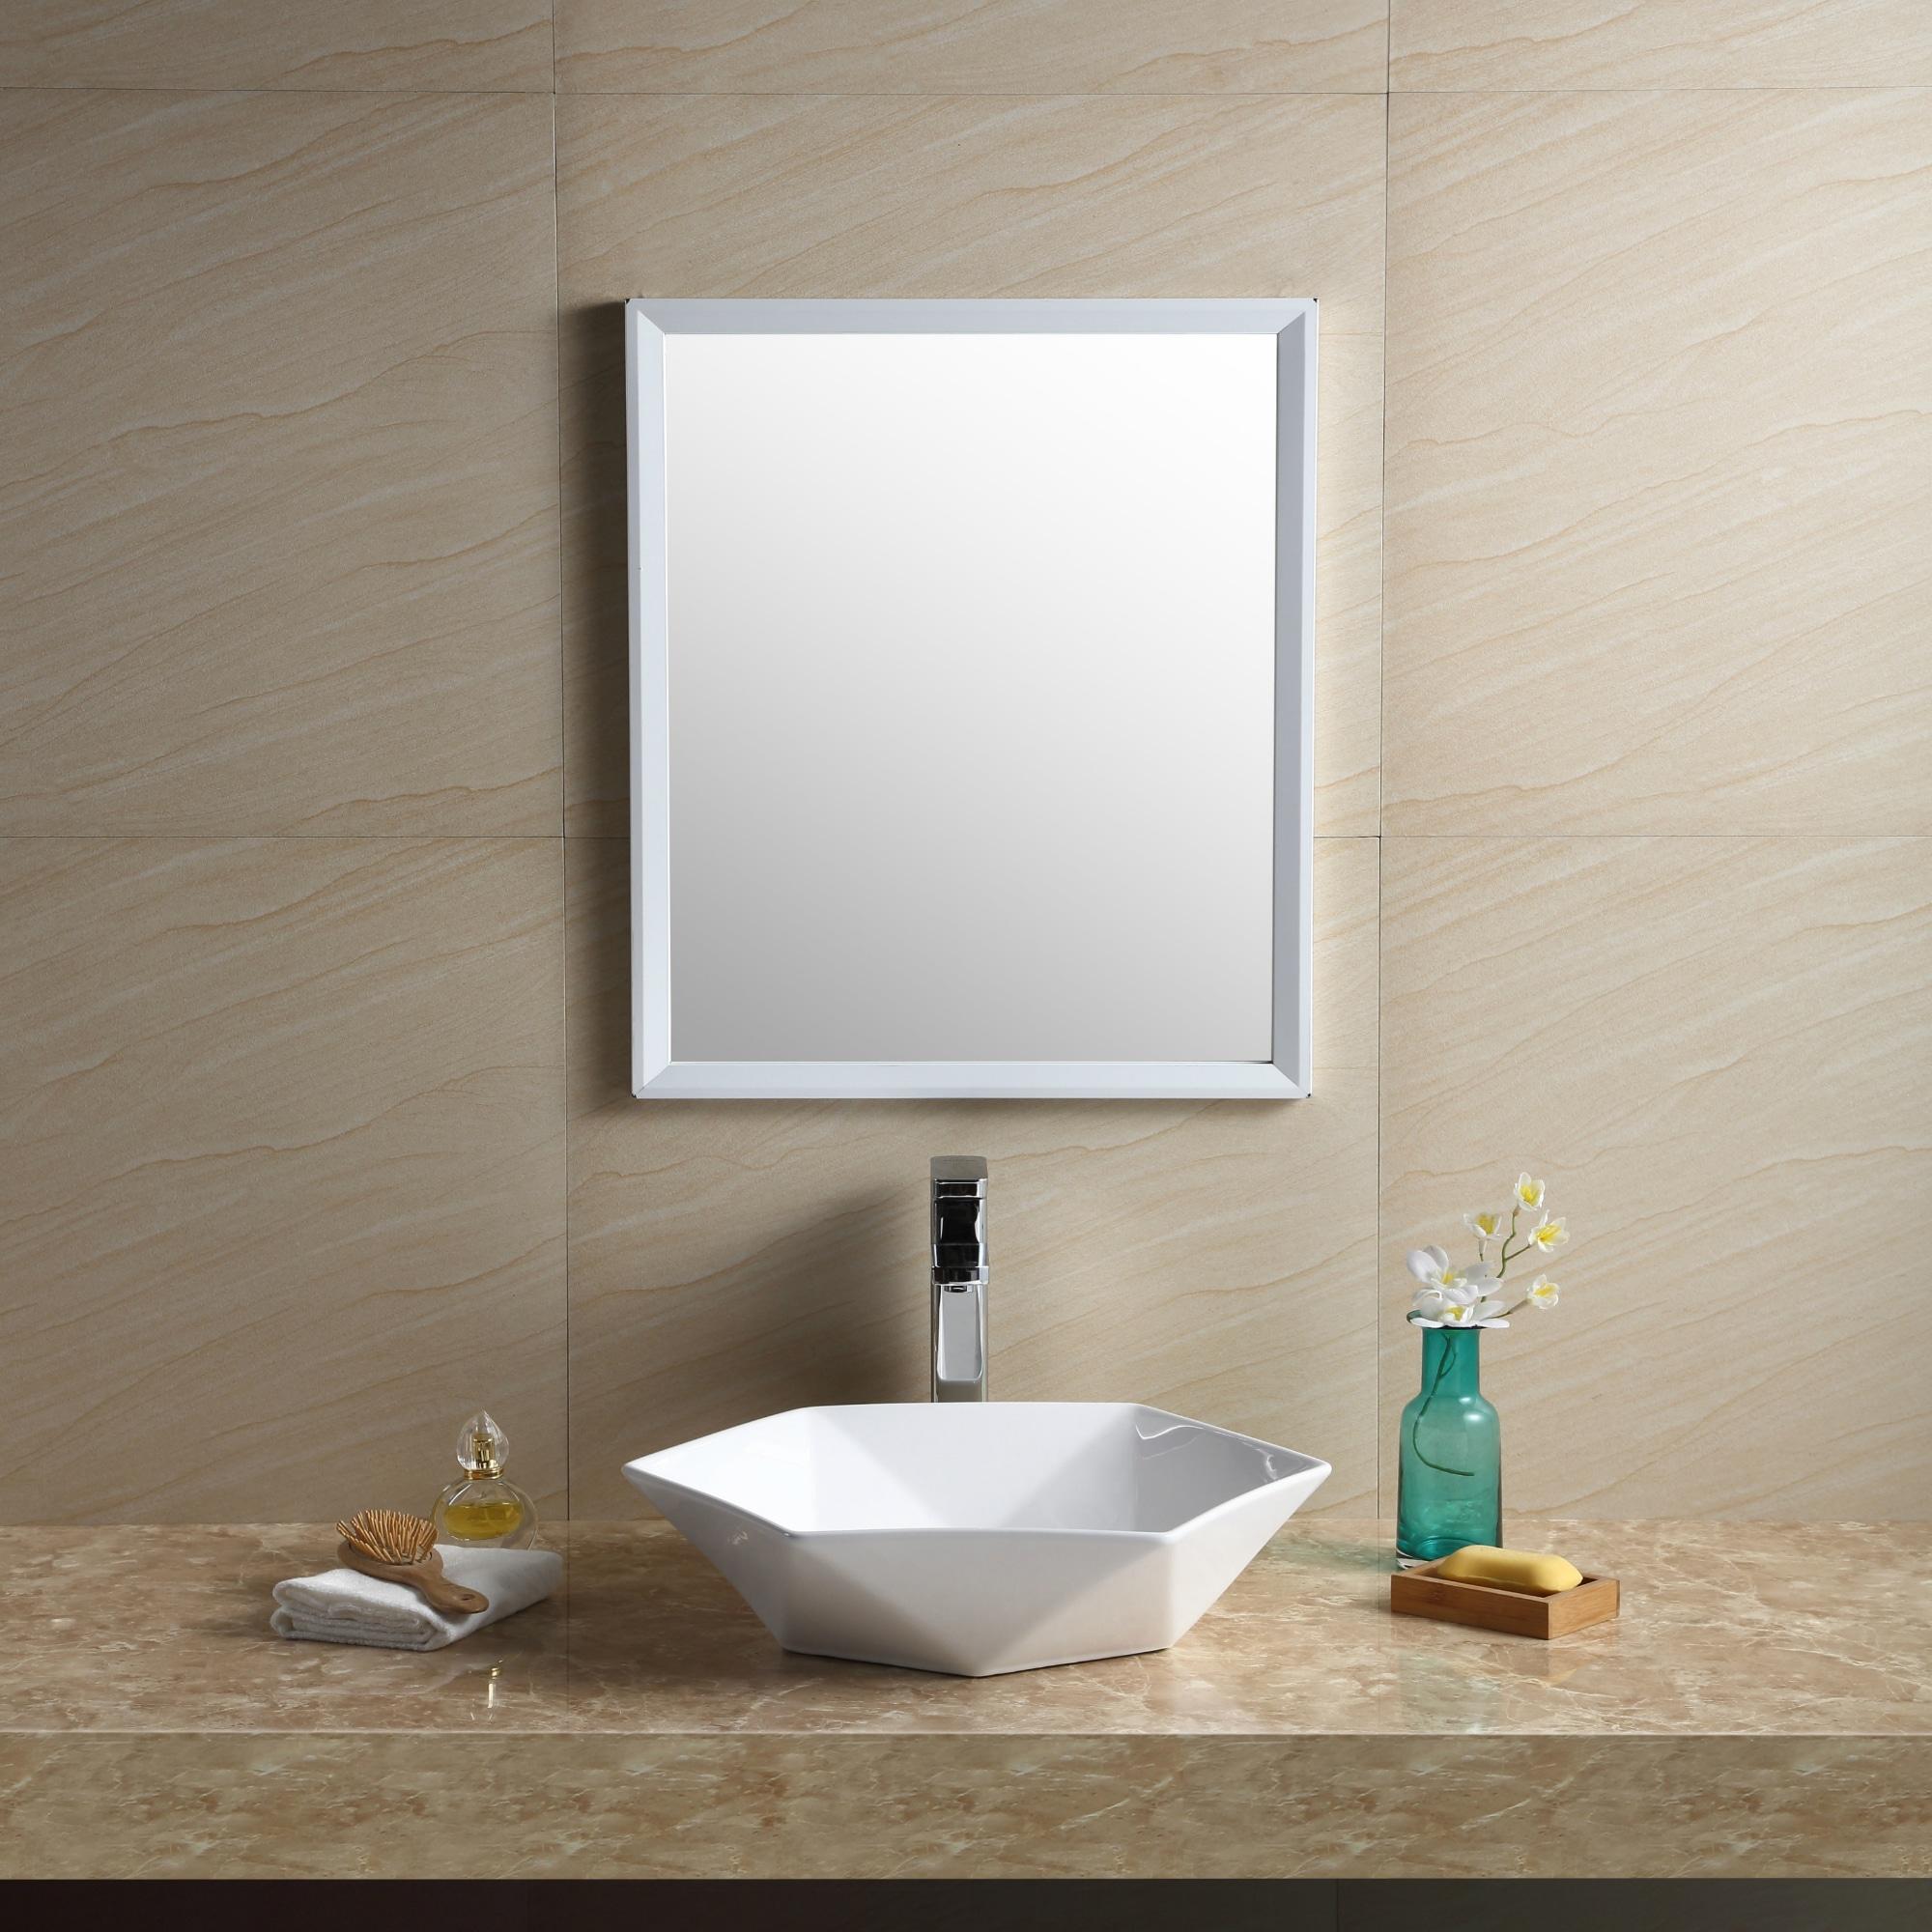 Shop Fine Fixtures White Vitreous China Hexagon Vessel Bathroom Sink ...